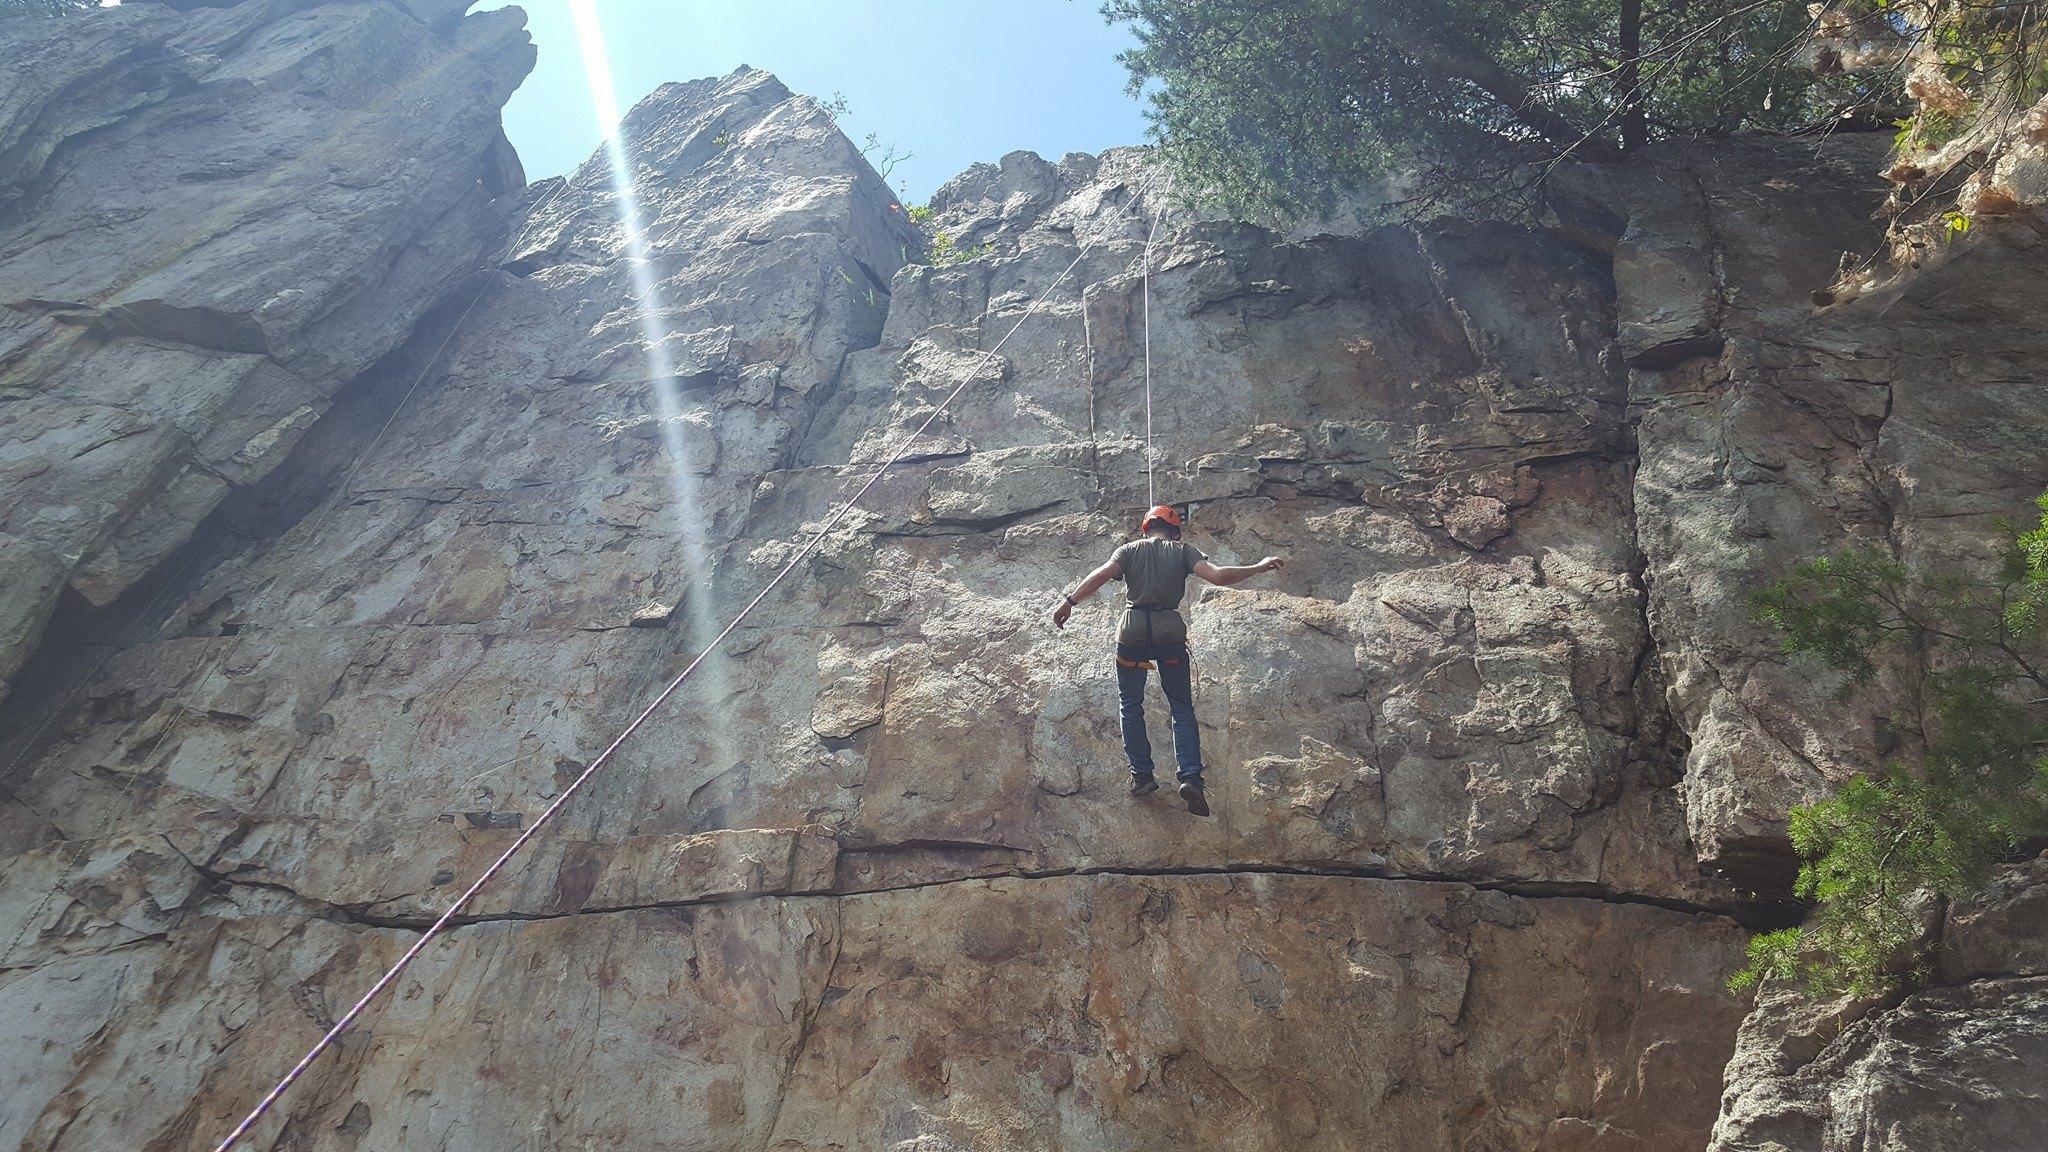 Rock Climbing Tours